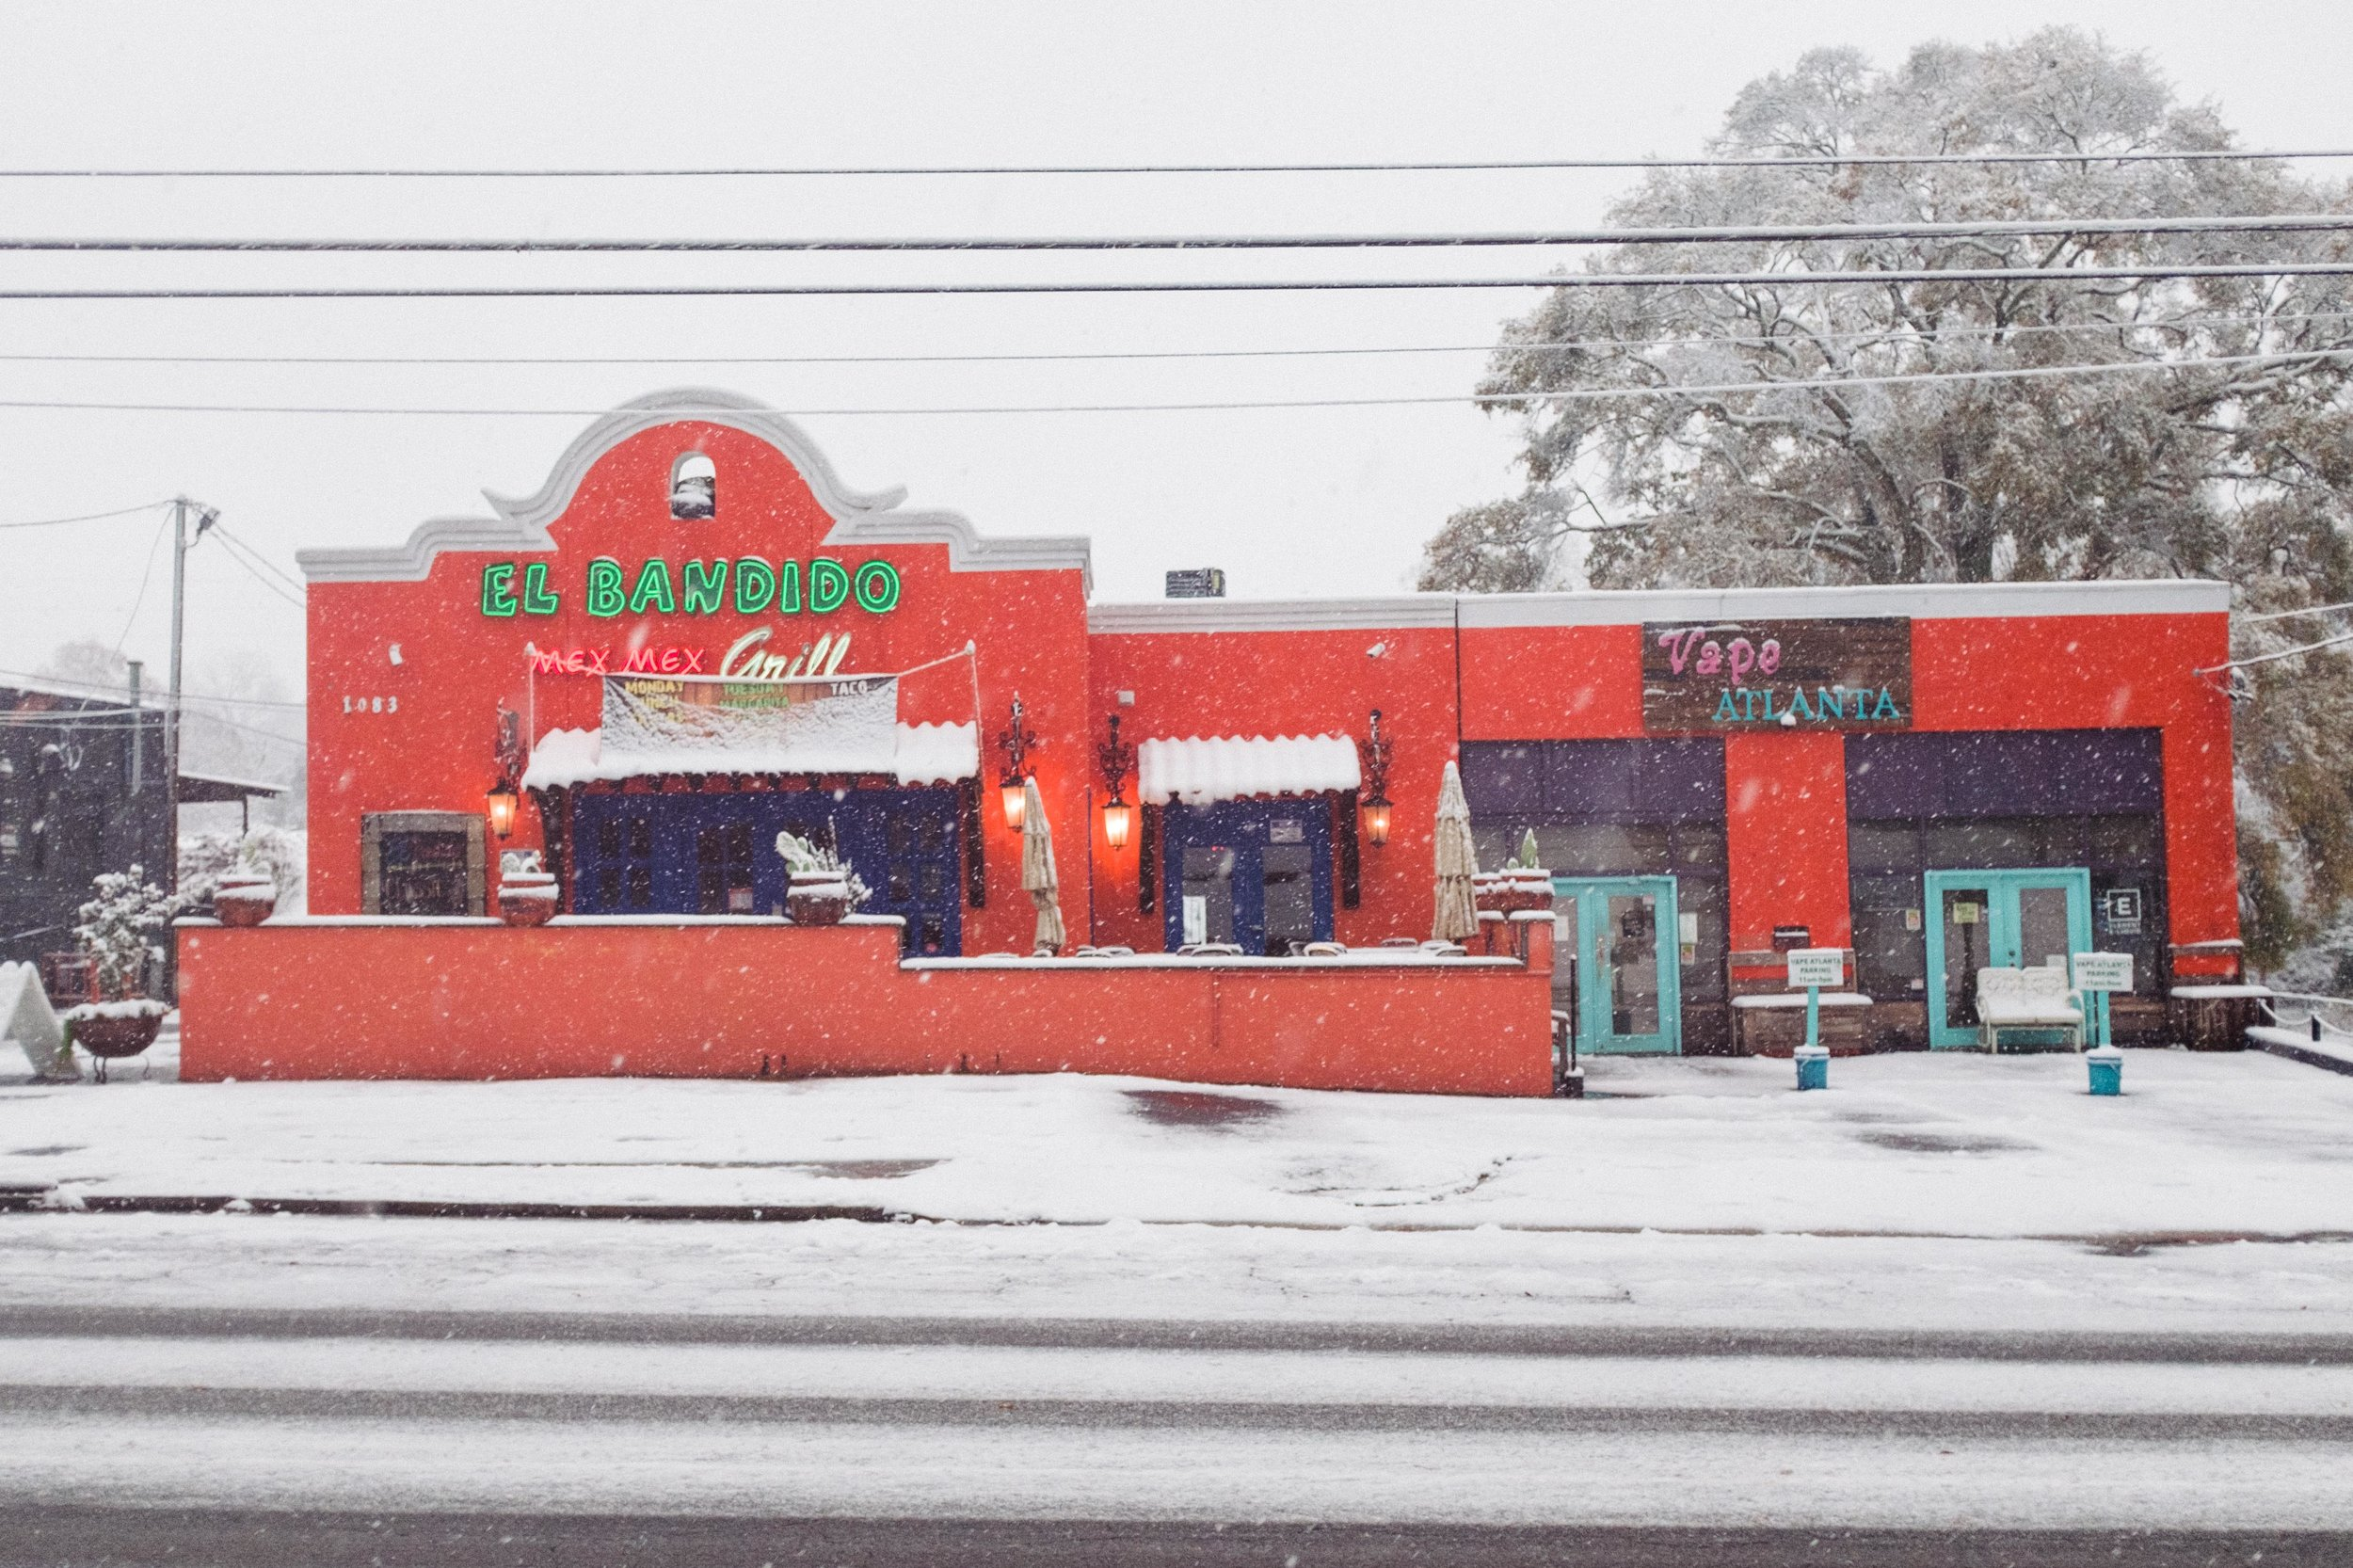 atlanta-georgia-snow-little-five-points-el-bandido